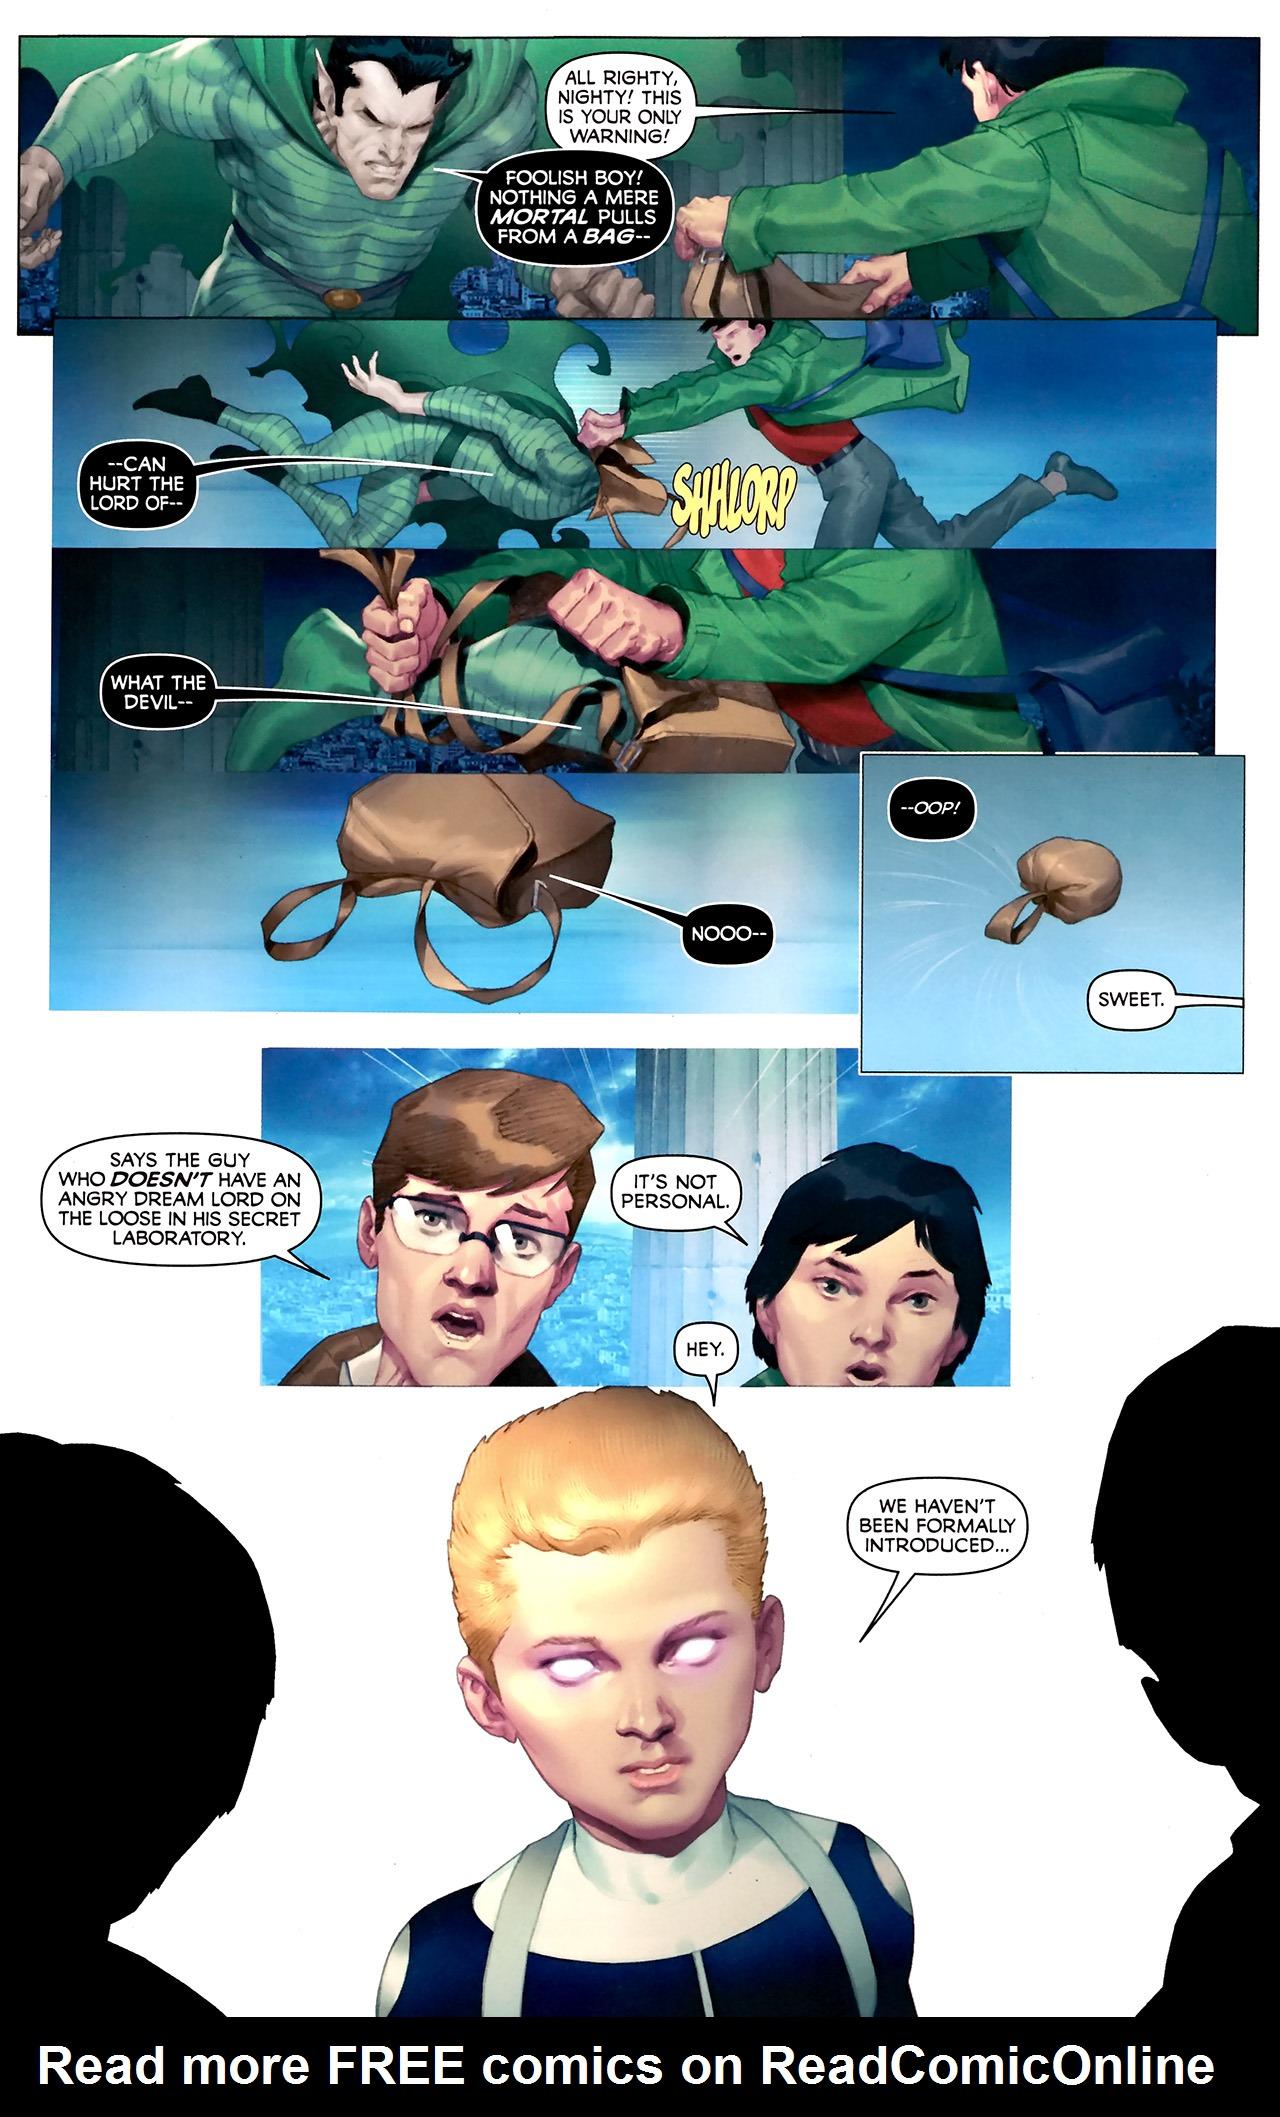 Read online Hercules: Fall of an Avenger comic -  Issue #2 - 13